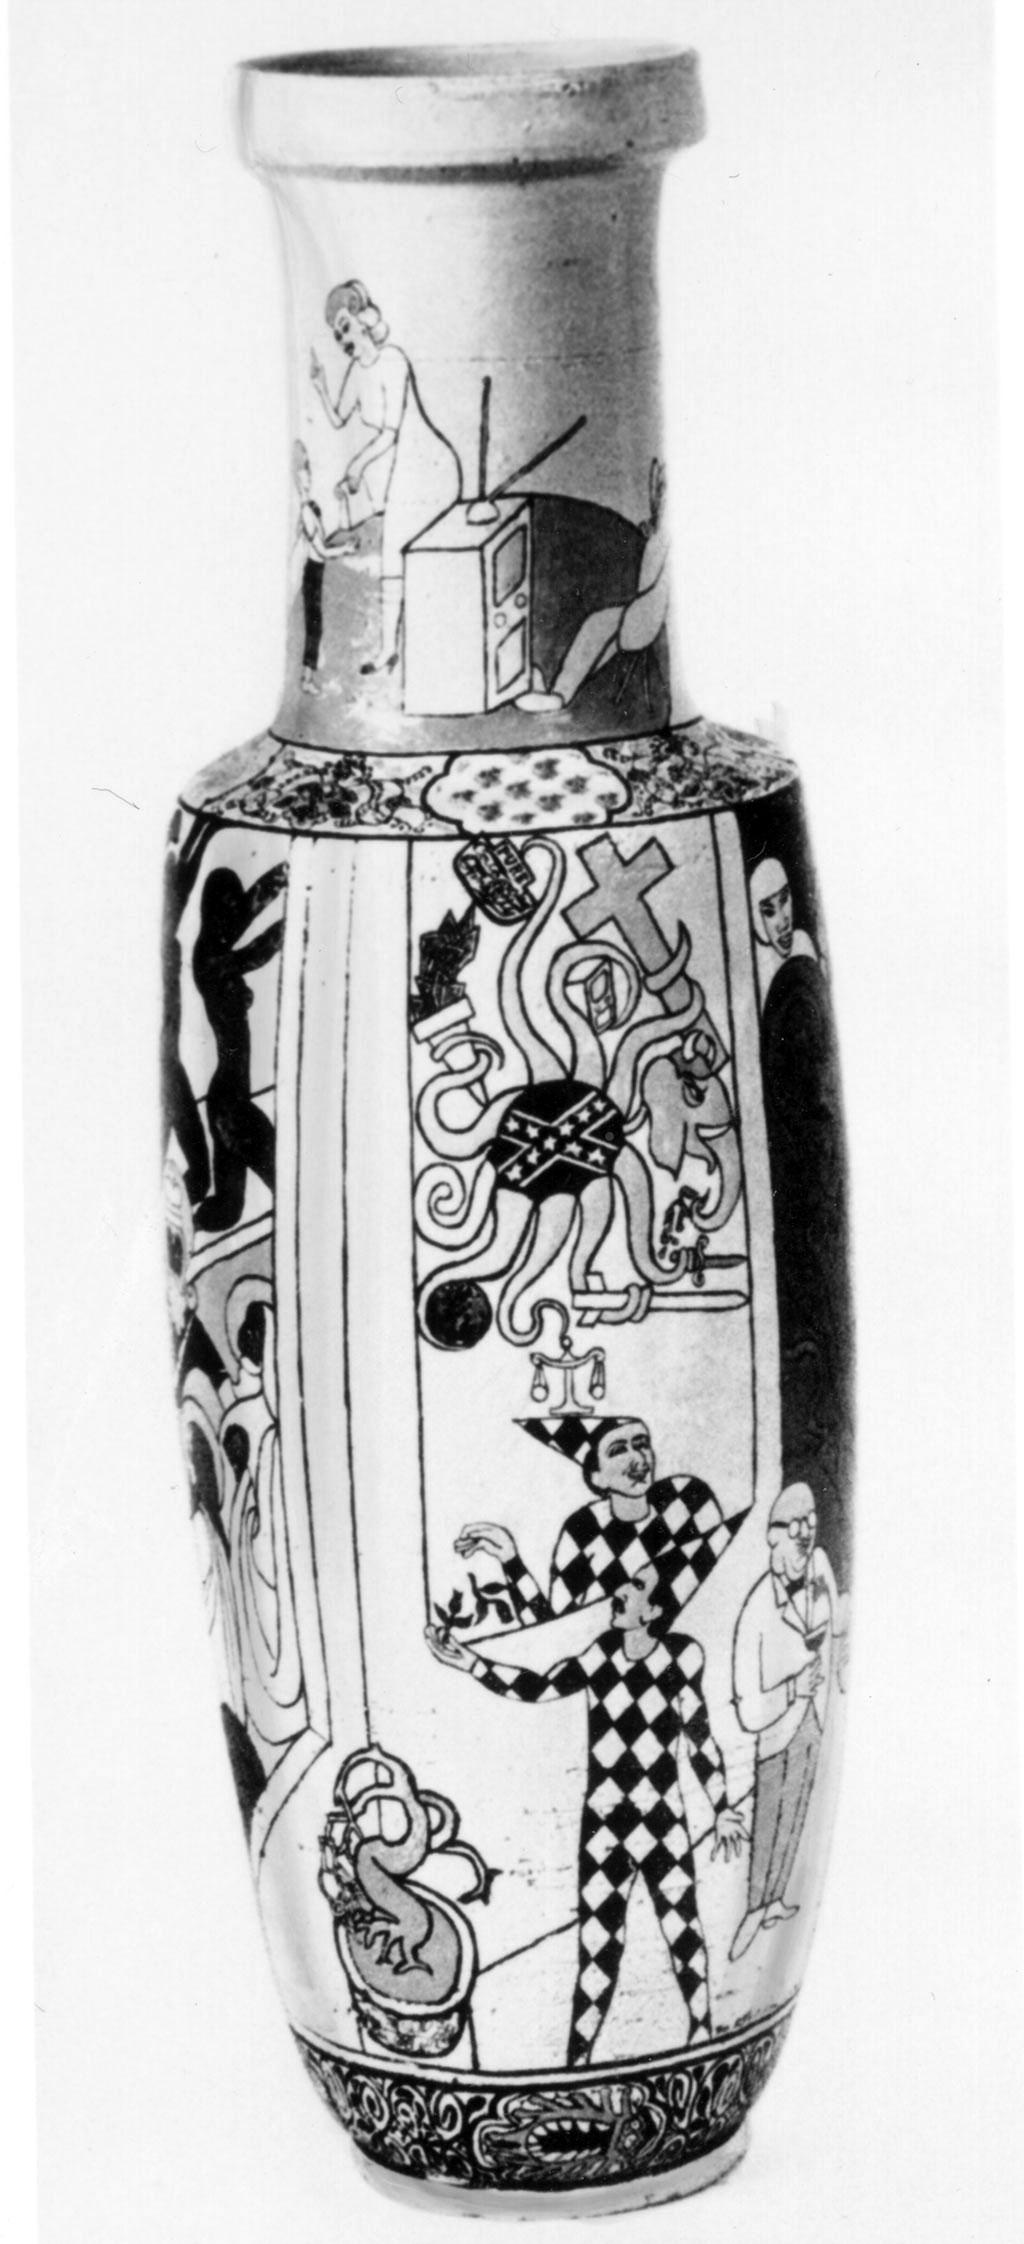 Tall vase by Michael Frimkess, c. 1966